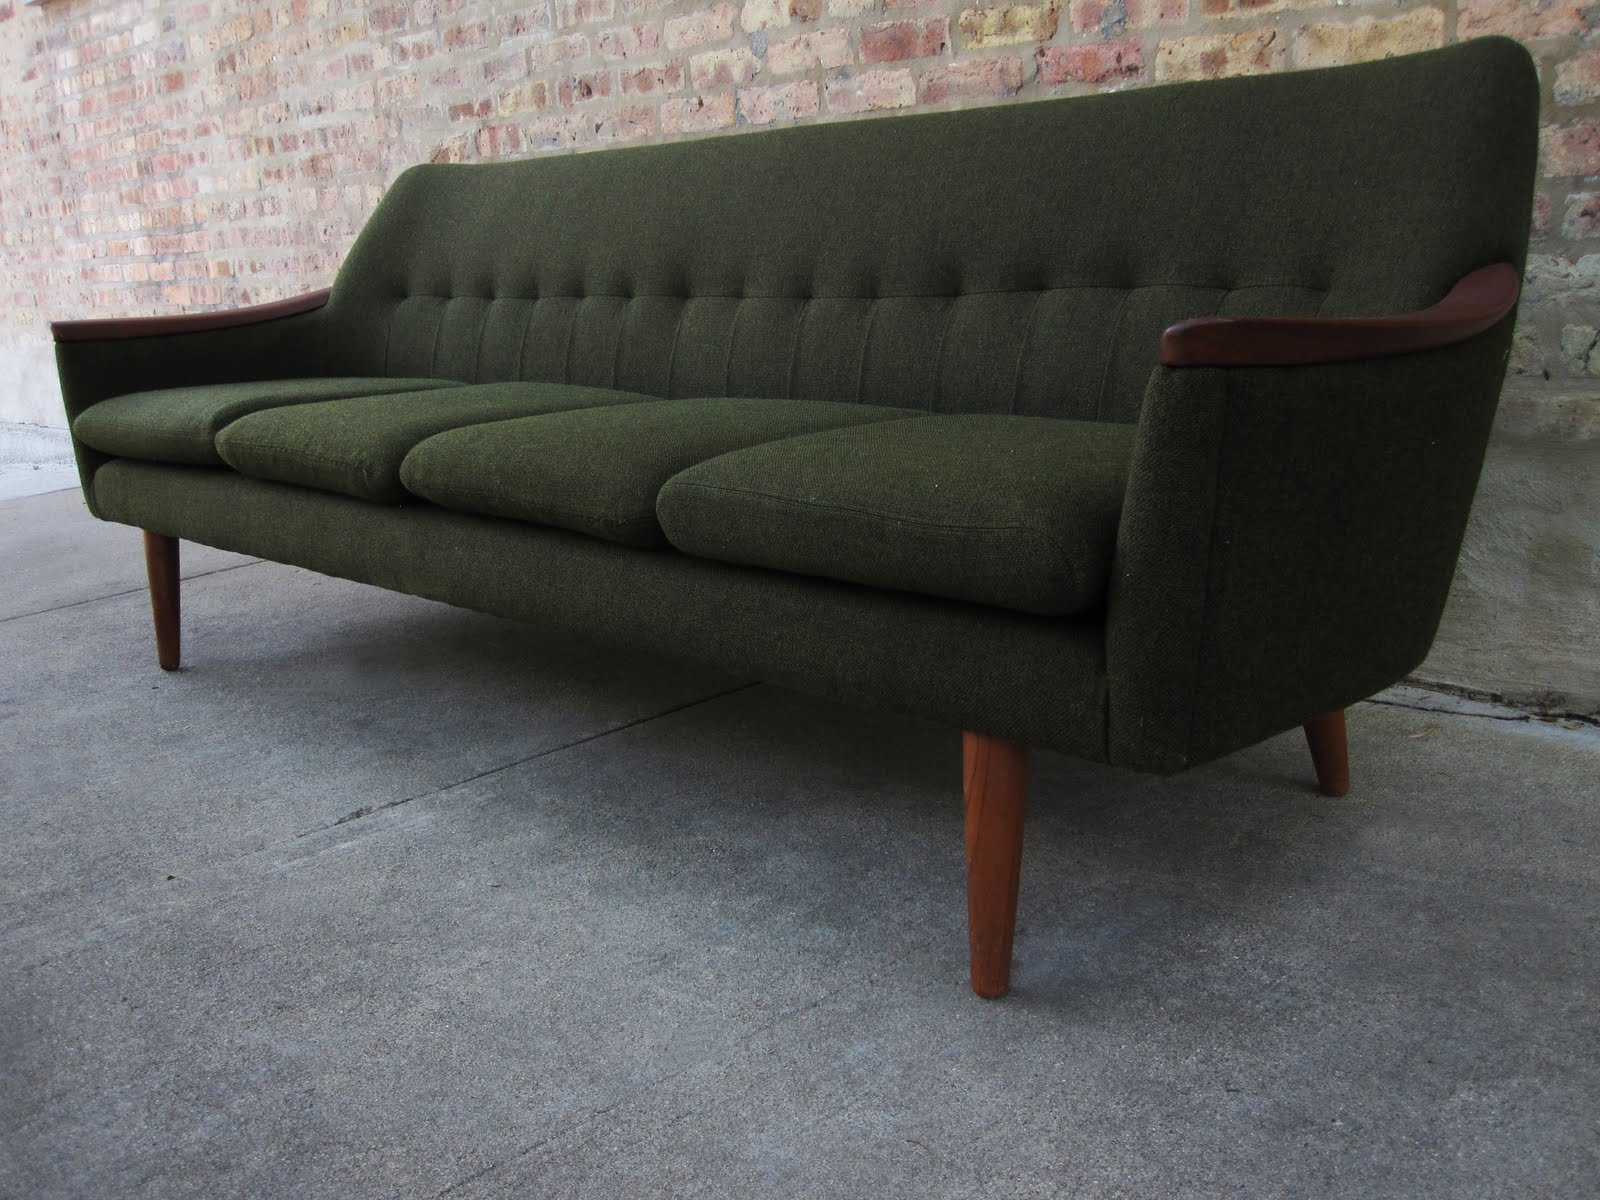 circa midcentury: 'danish modern' teak sofa